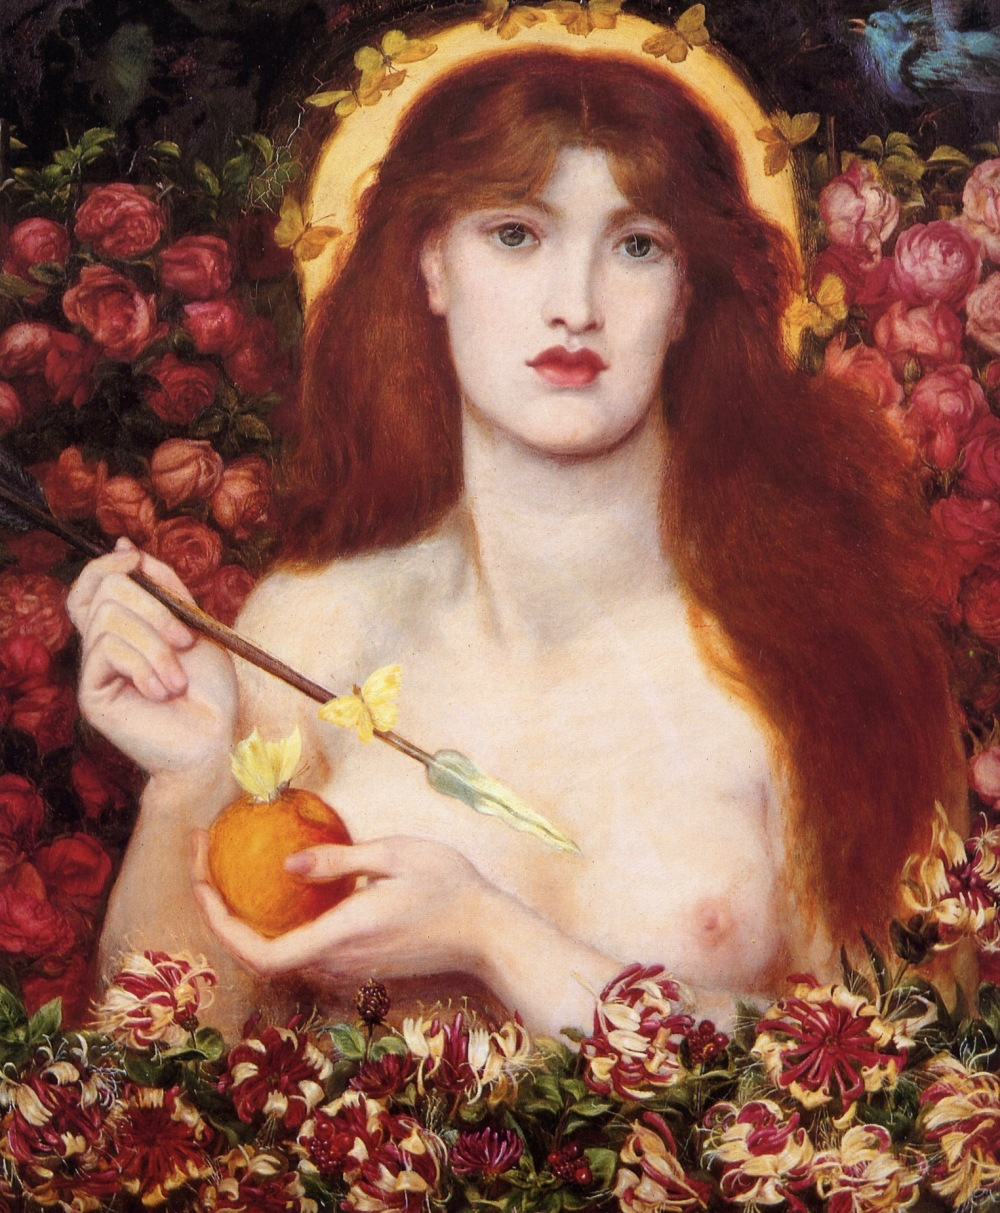 Dante_Gabriel_Rossetti_-_Venus_Verticordia (1).jpg